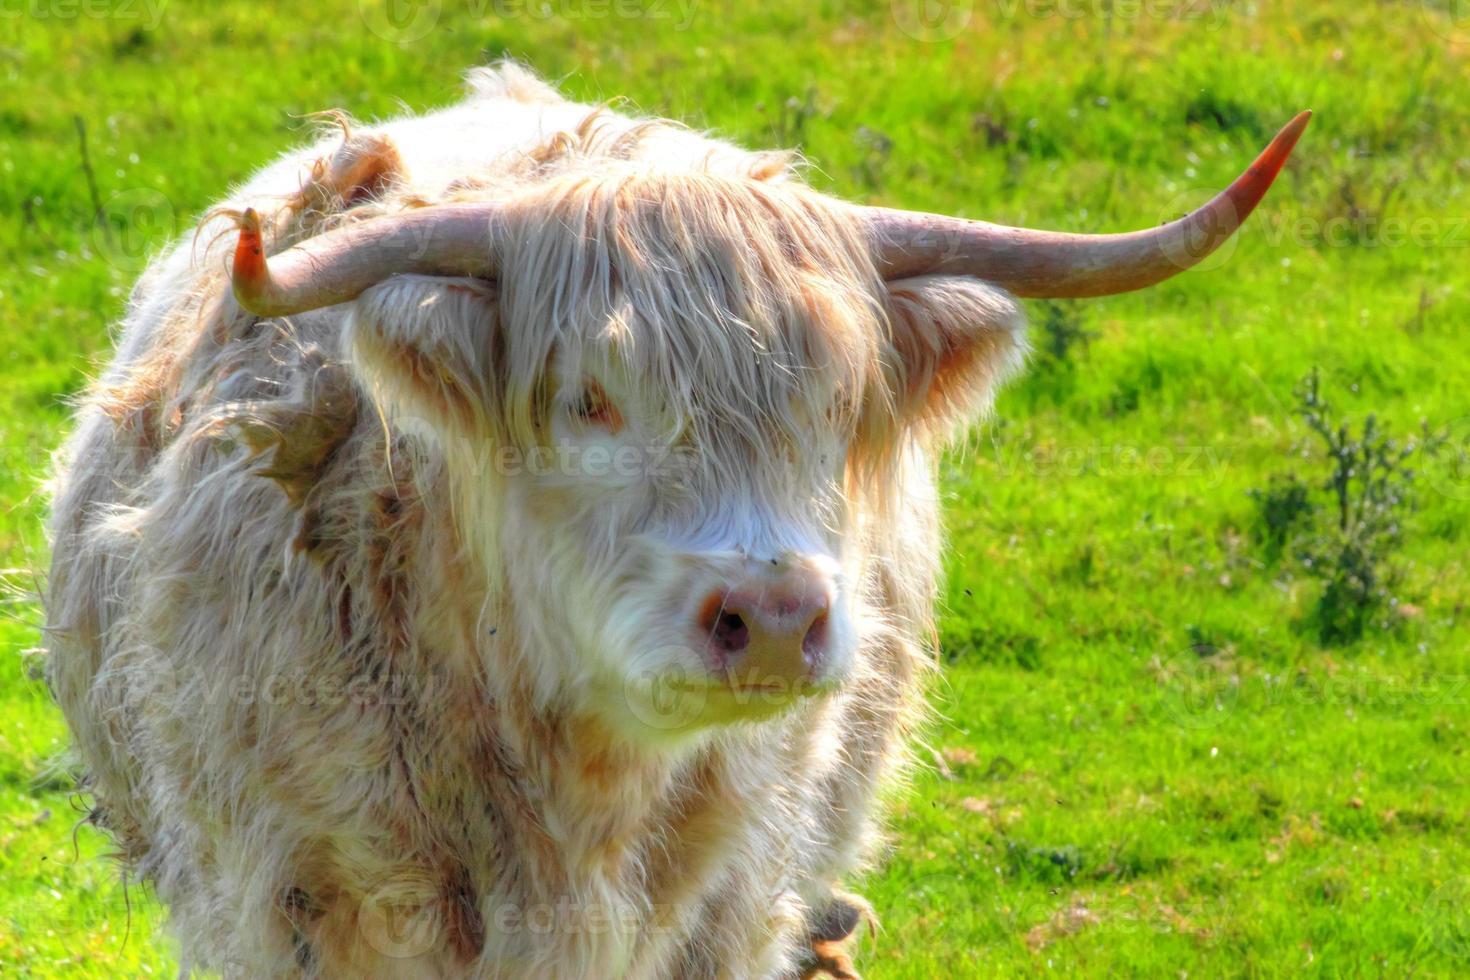 hoogland koe. foto